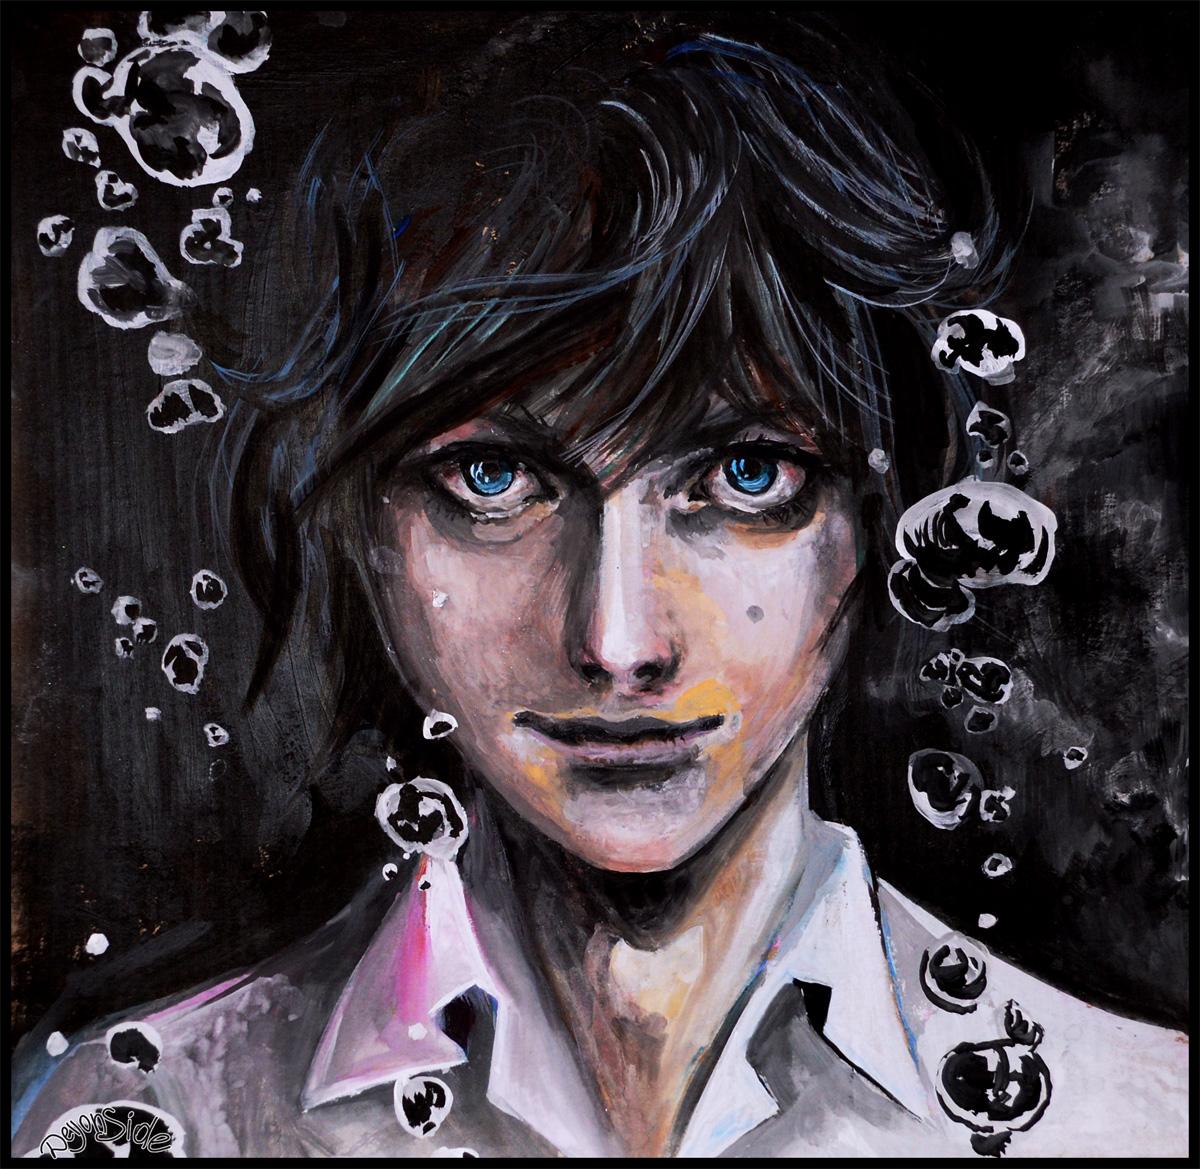 Original character/ redraw by DeyonSide